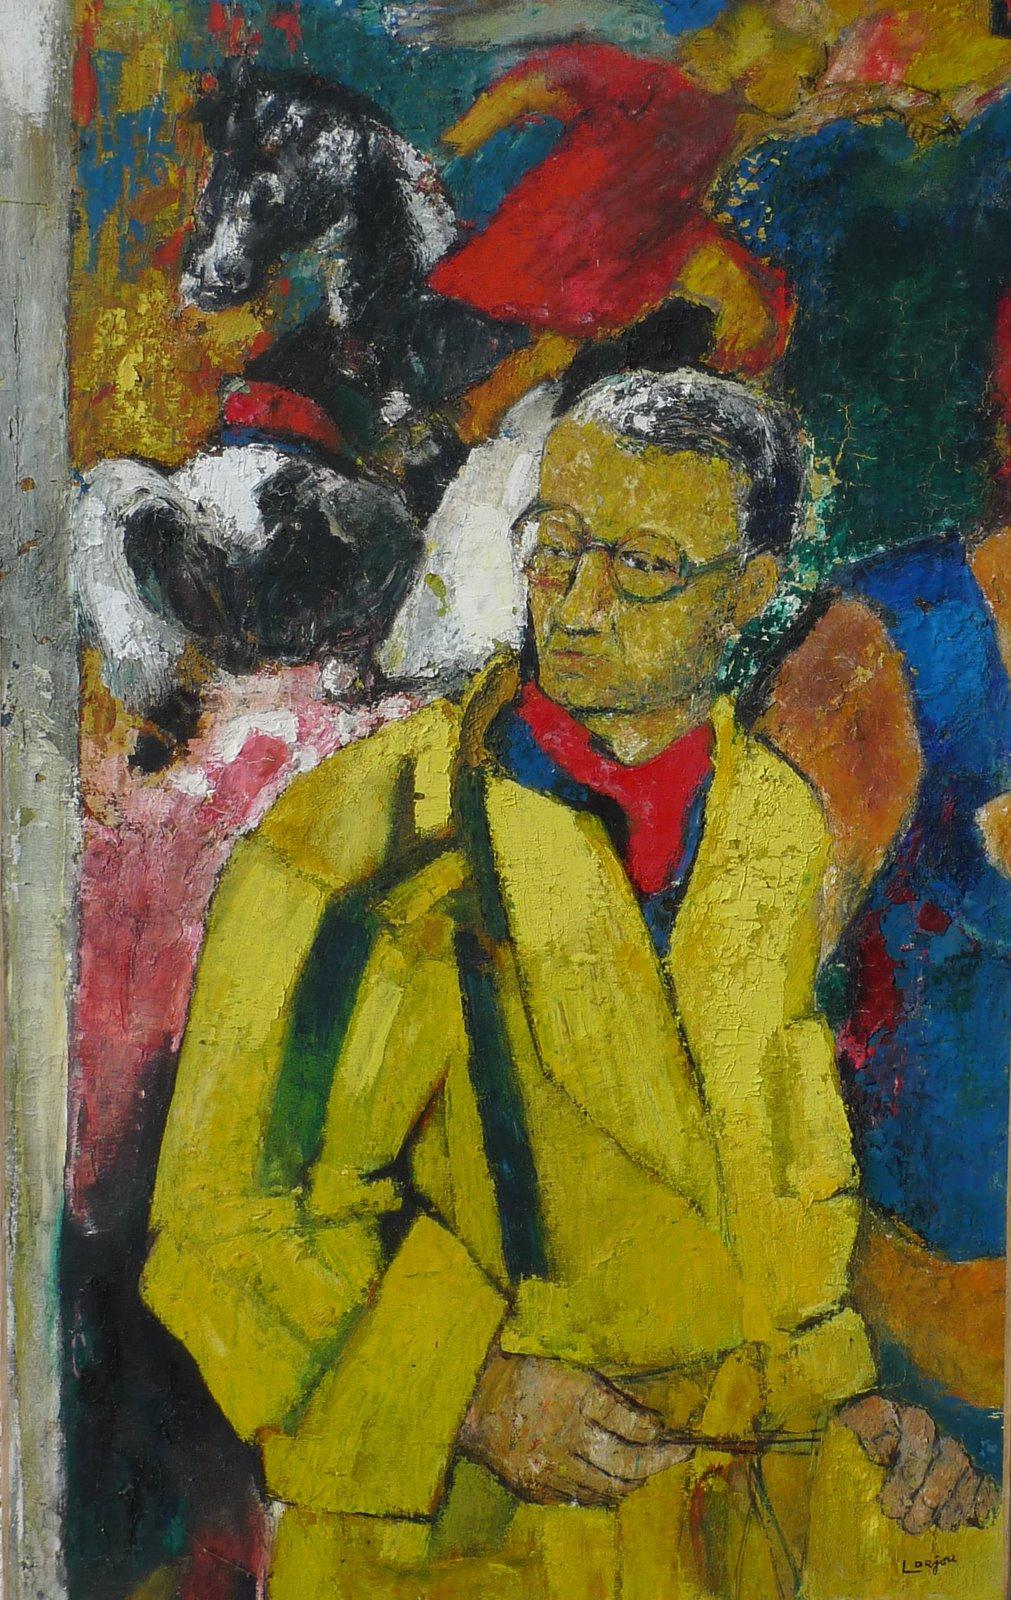 Autoportrait in yellow (c.1945-49)